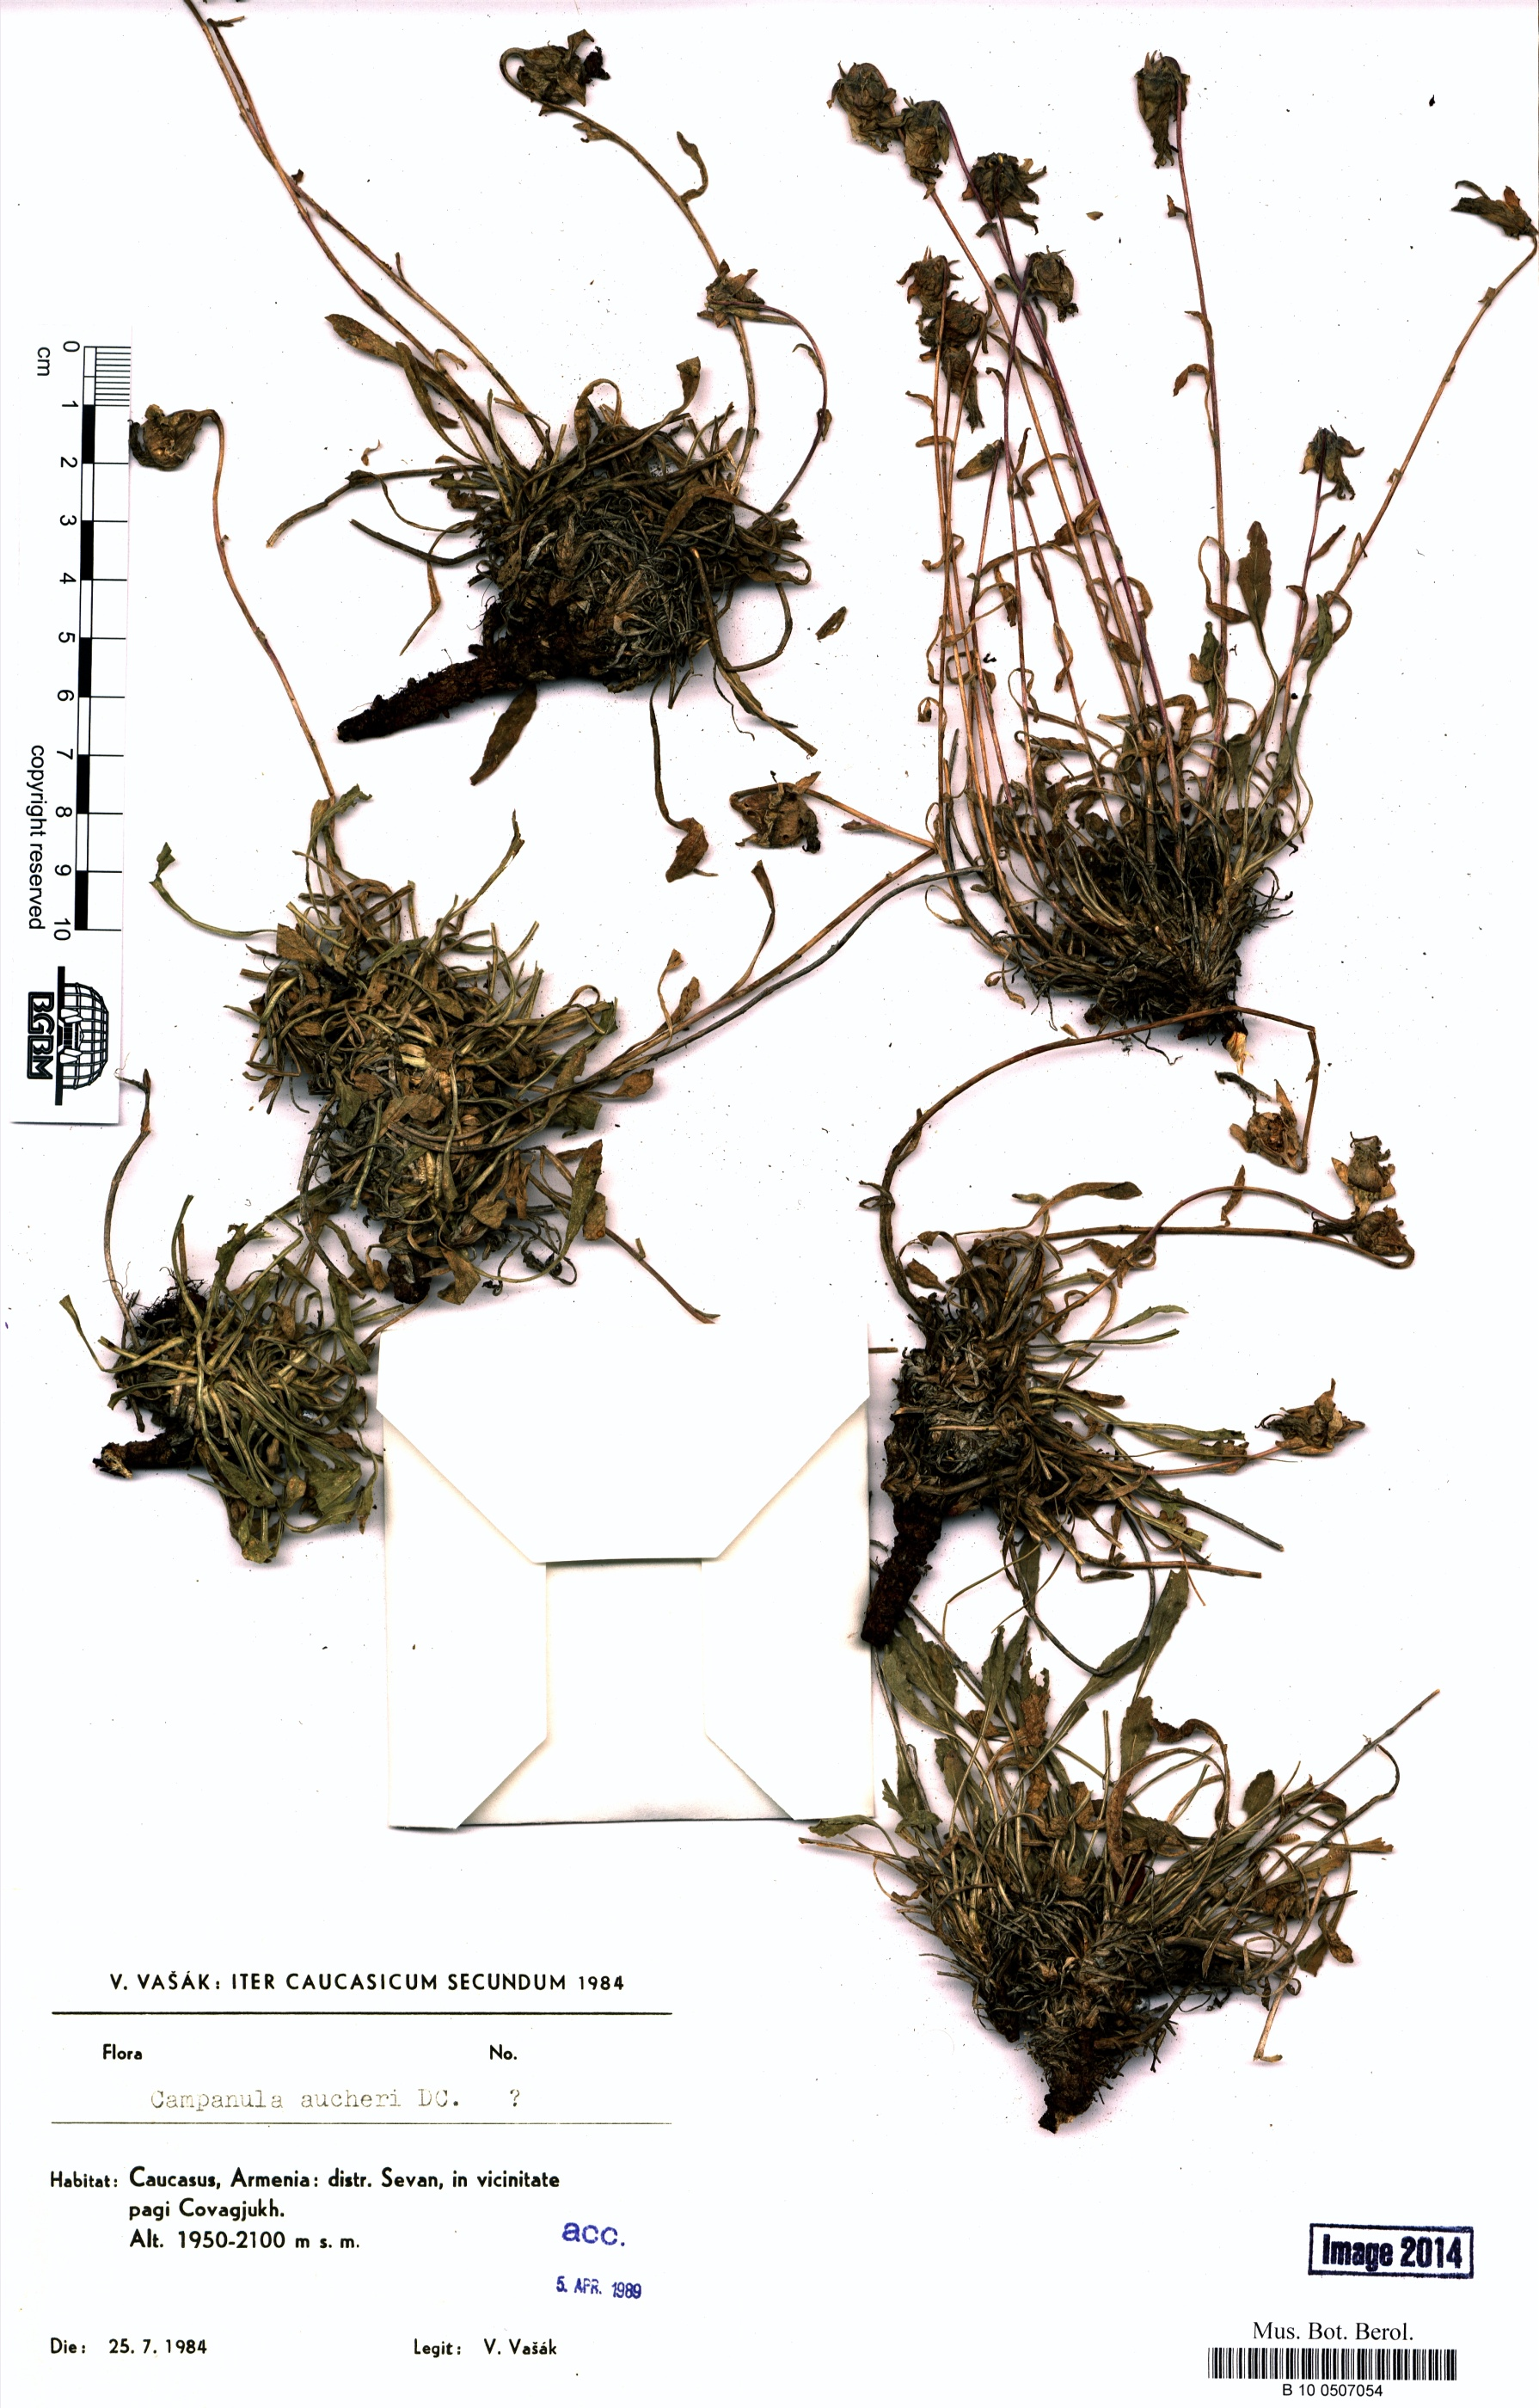 http://ww2.bgbm.org/herbarium/images/B/10/05/07/05/B_10_0507054.jpg